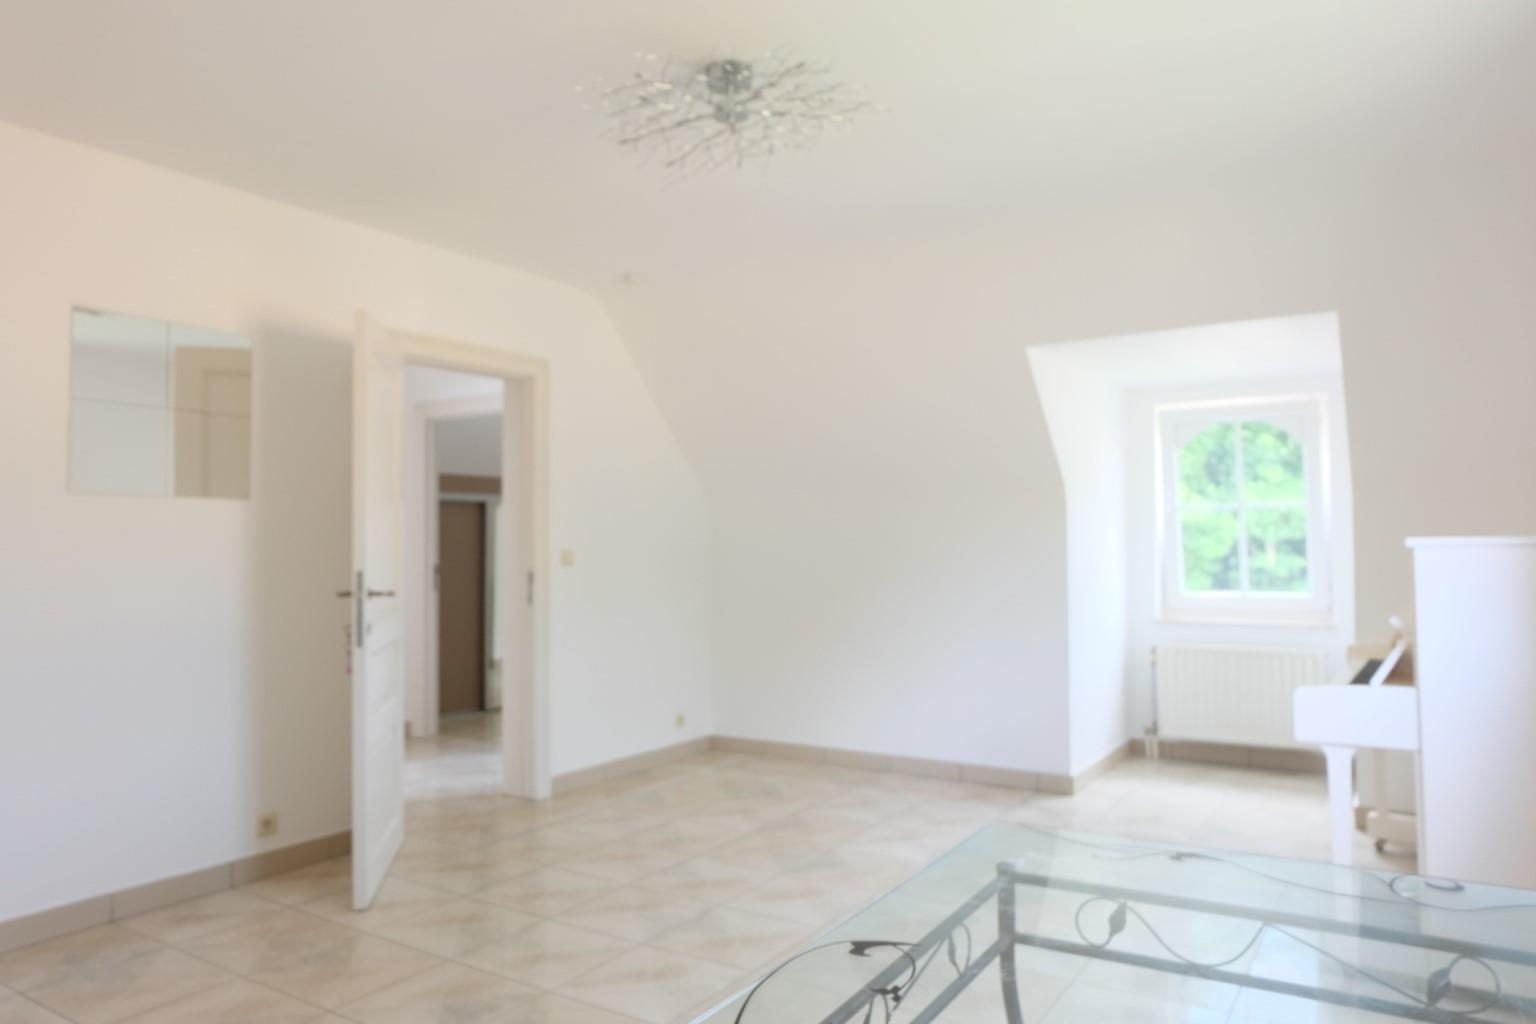 Appartement - Ittre Virginal-Samme - #2050724-2